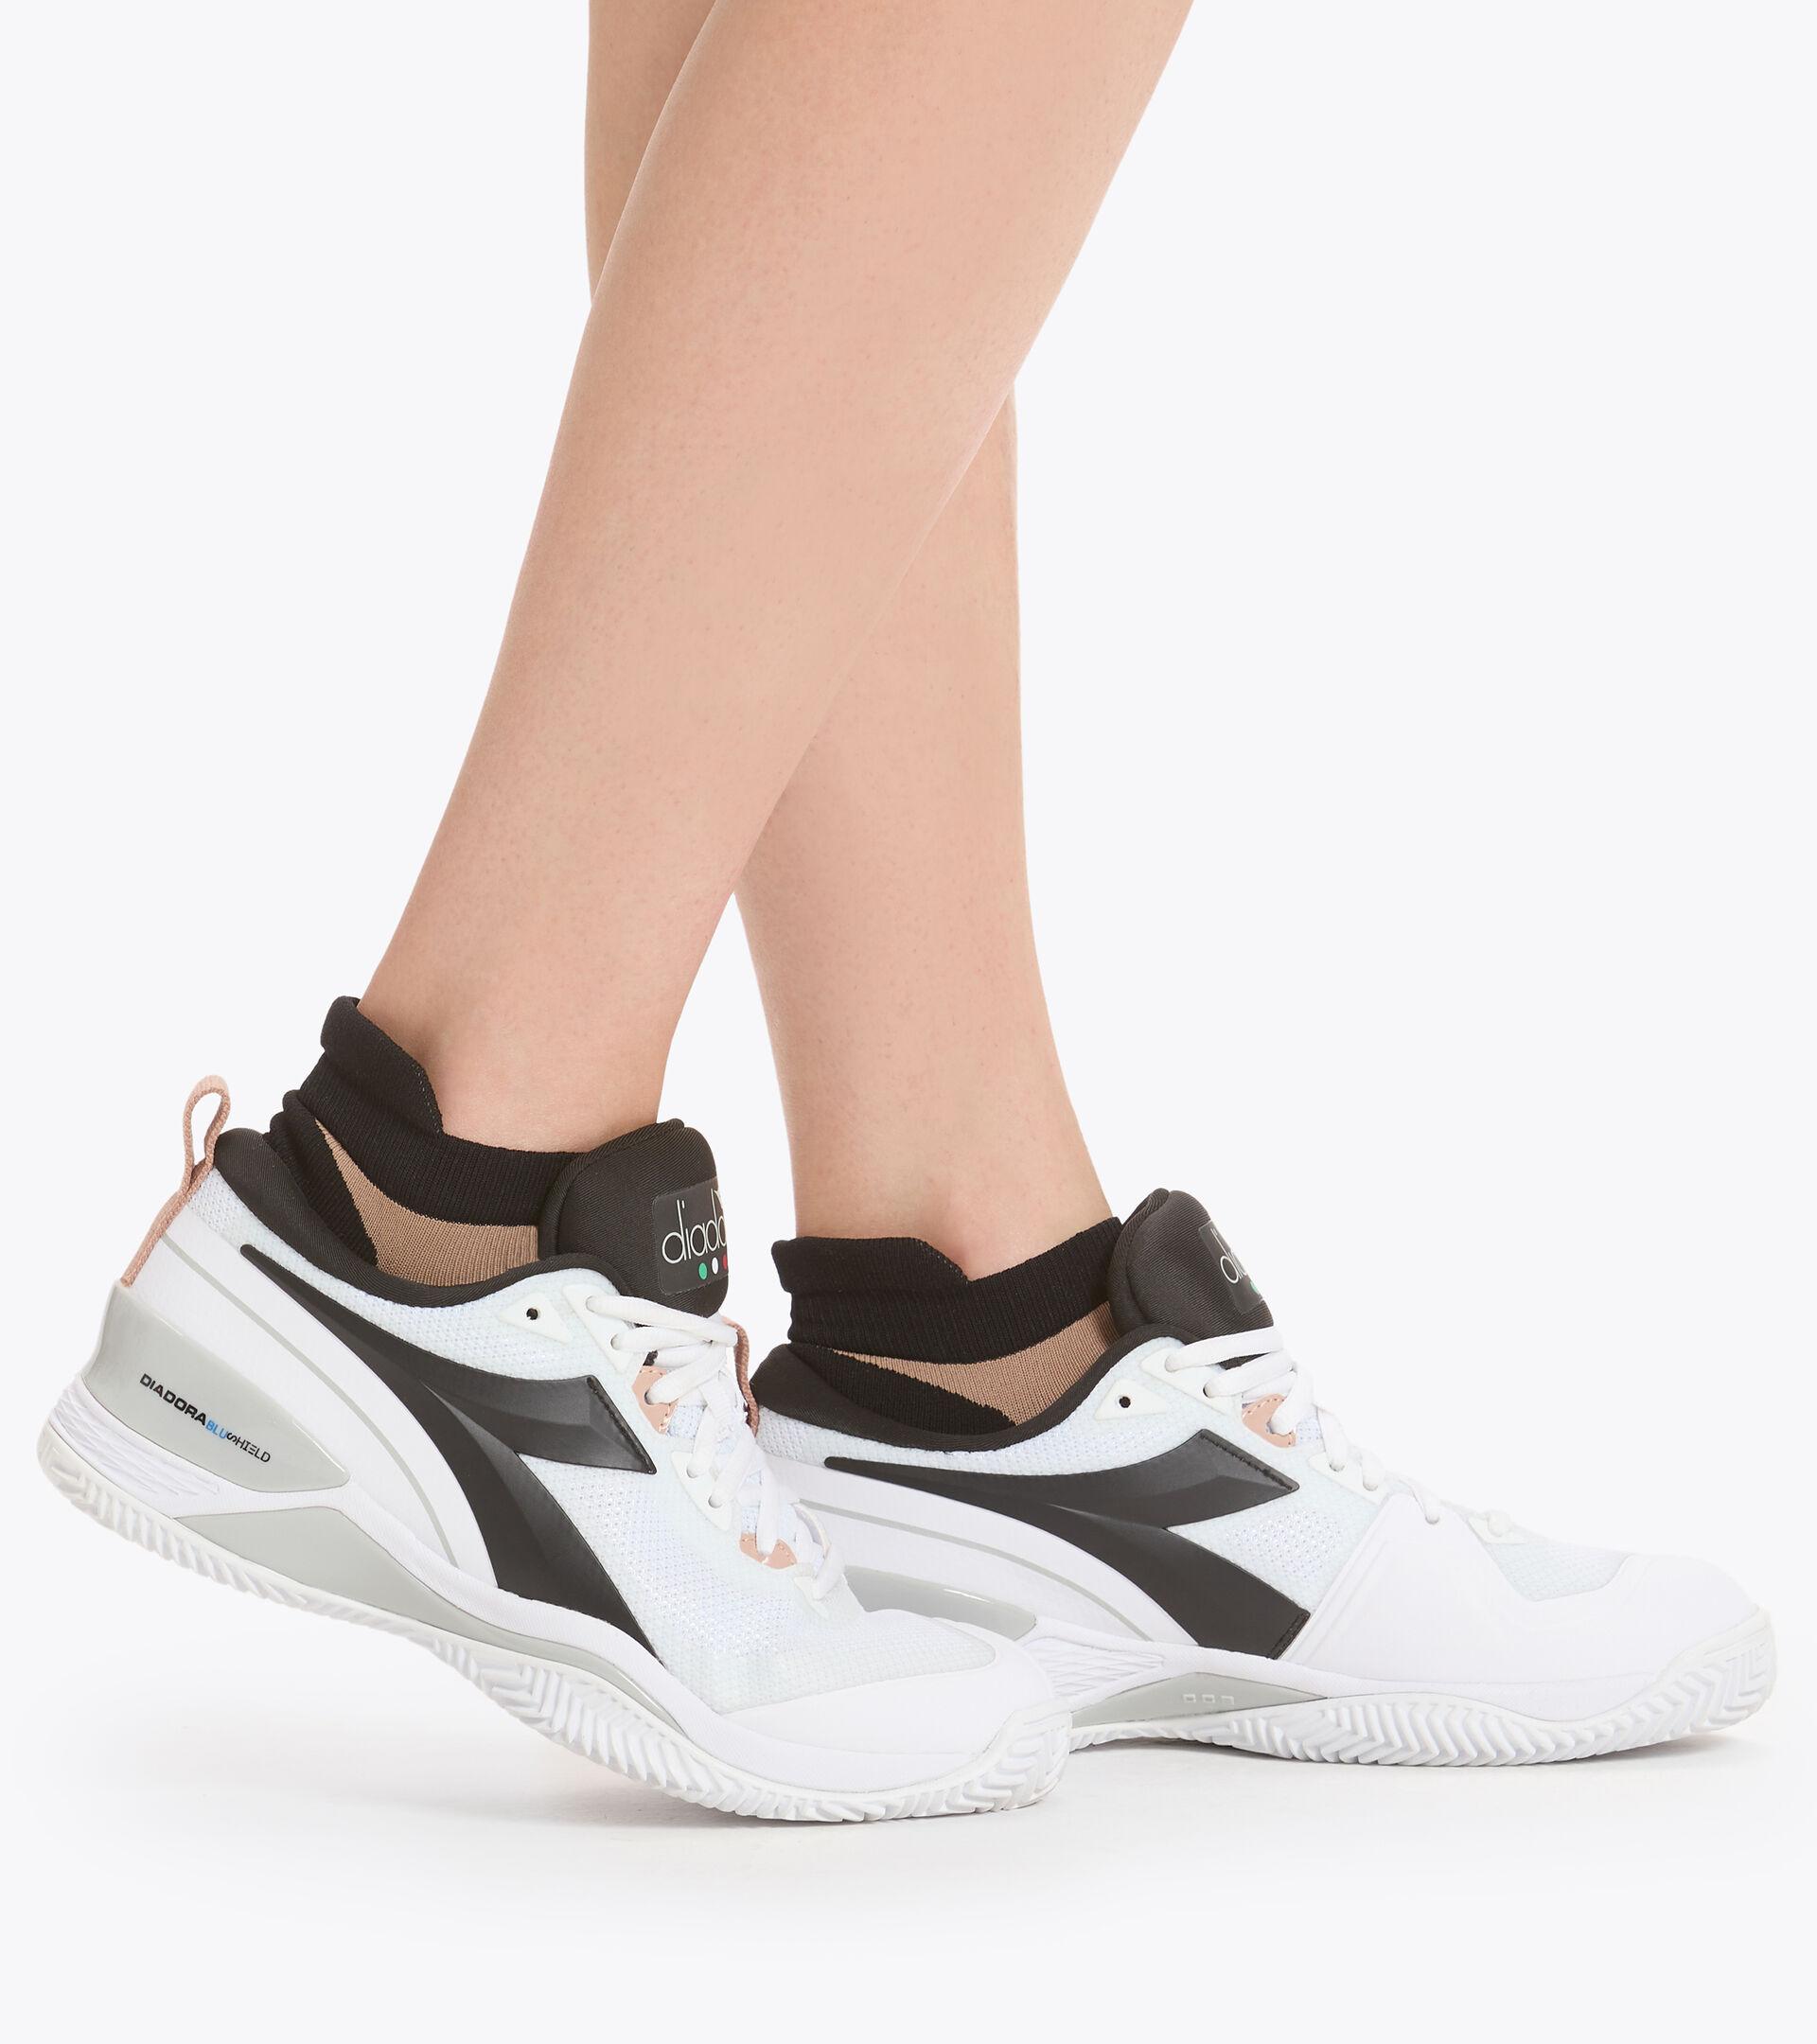 Footwear Sport DONNA SPEED BLUSHIELD 5 W CLAY WHITE/SILVER/BLACK. Diadora